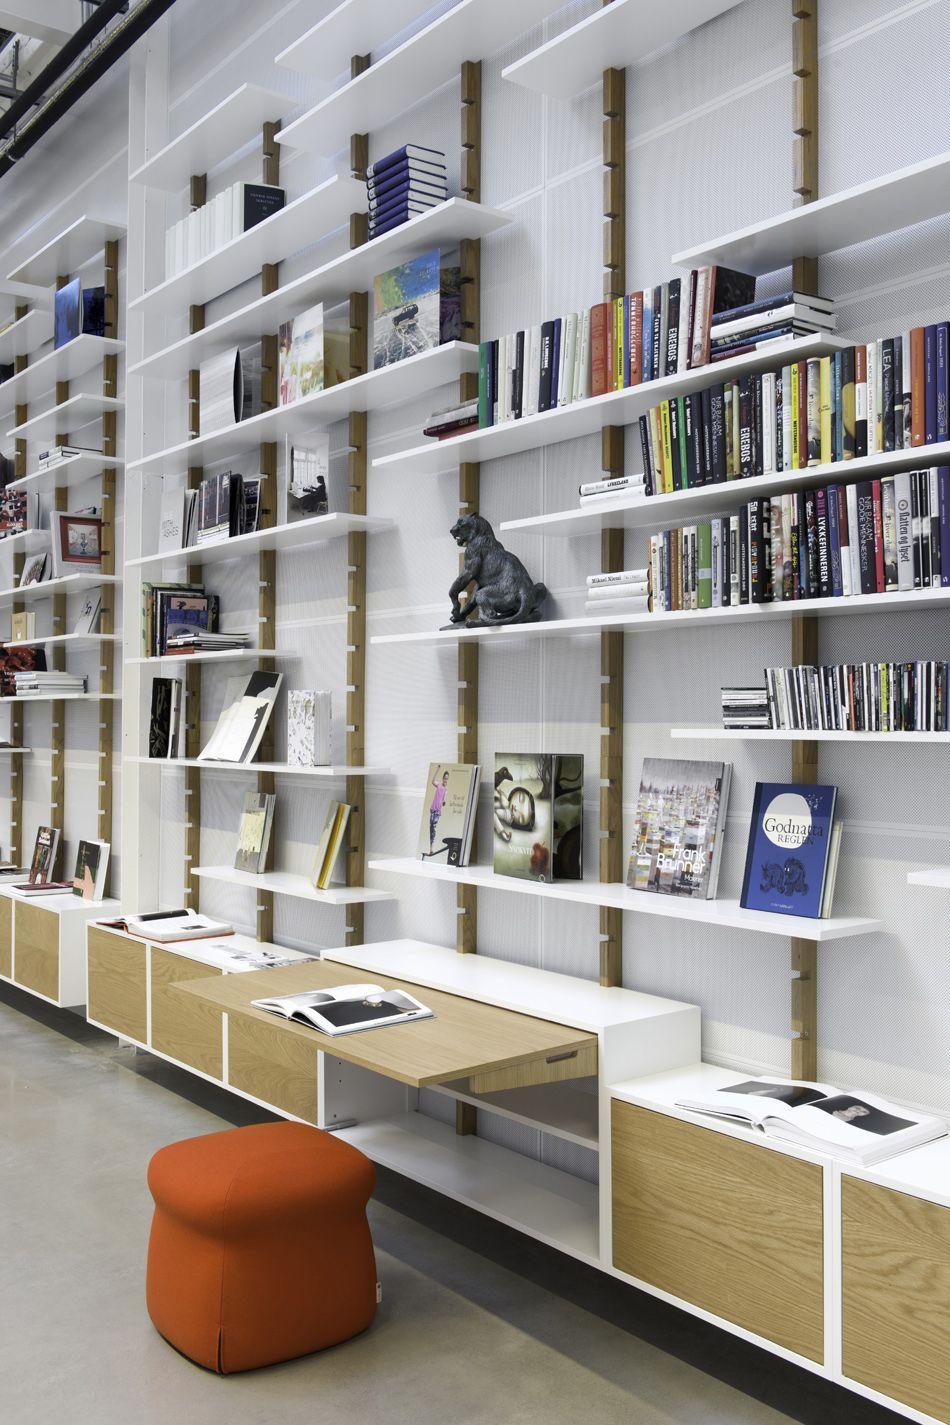 Purnorsk Abel 06 Trehus Inspiration Pinterest Shelf Design  # Bibliotheque Placo Design